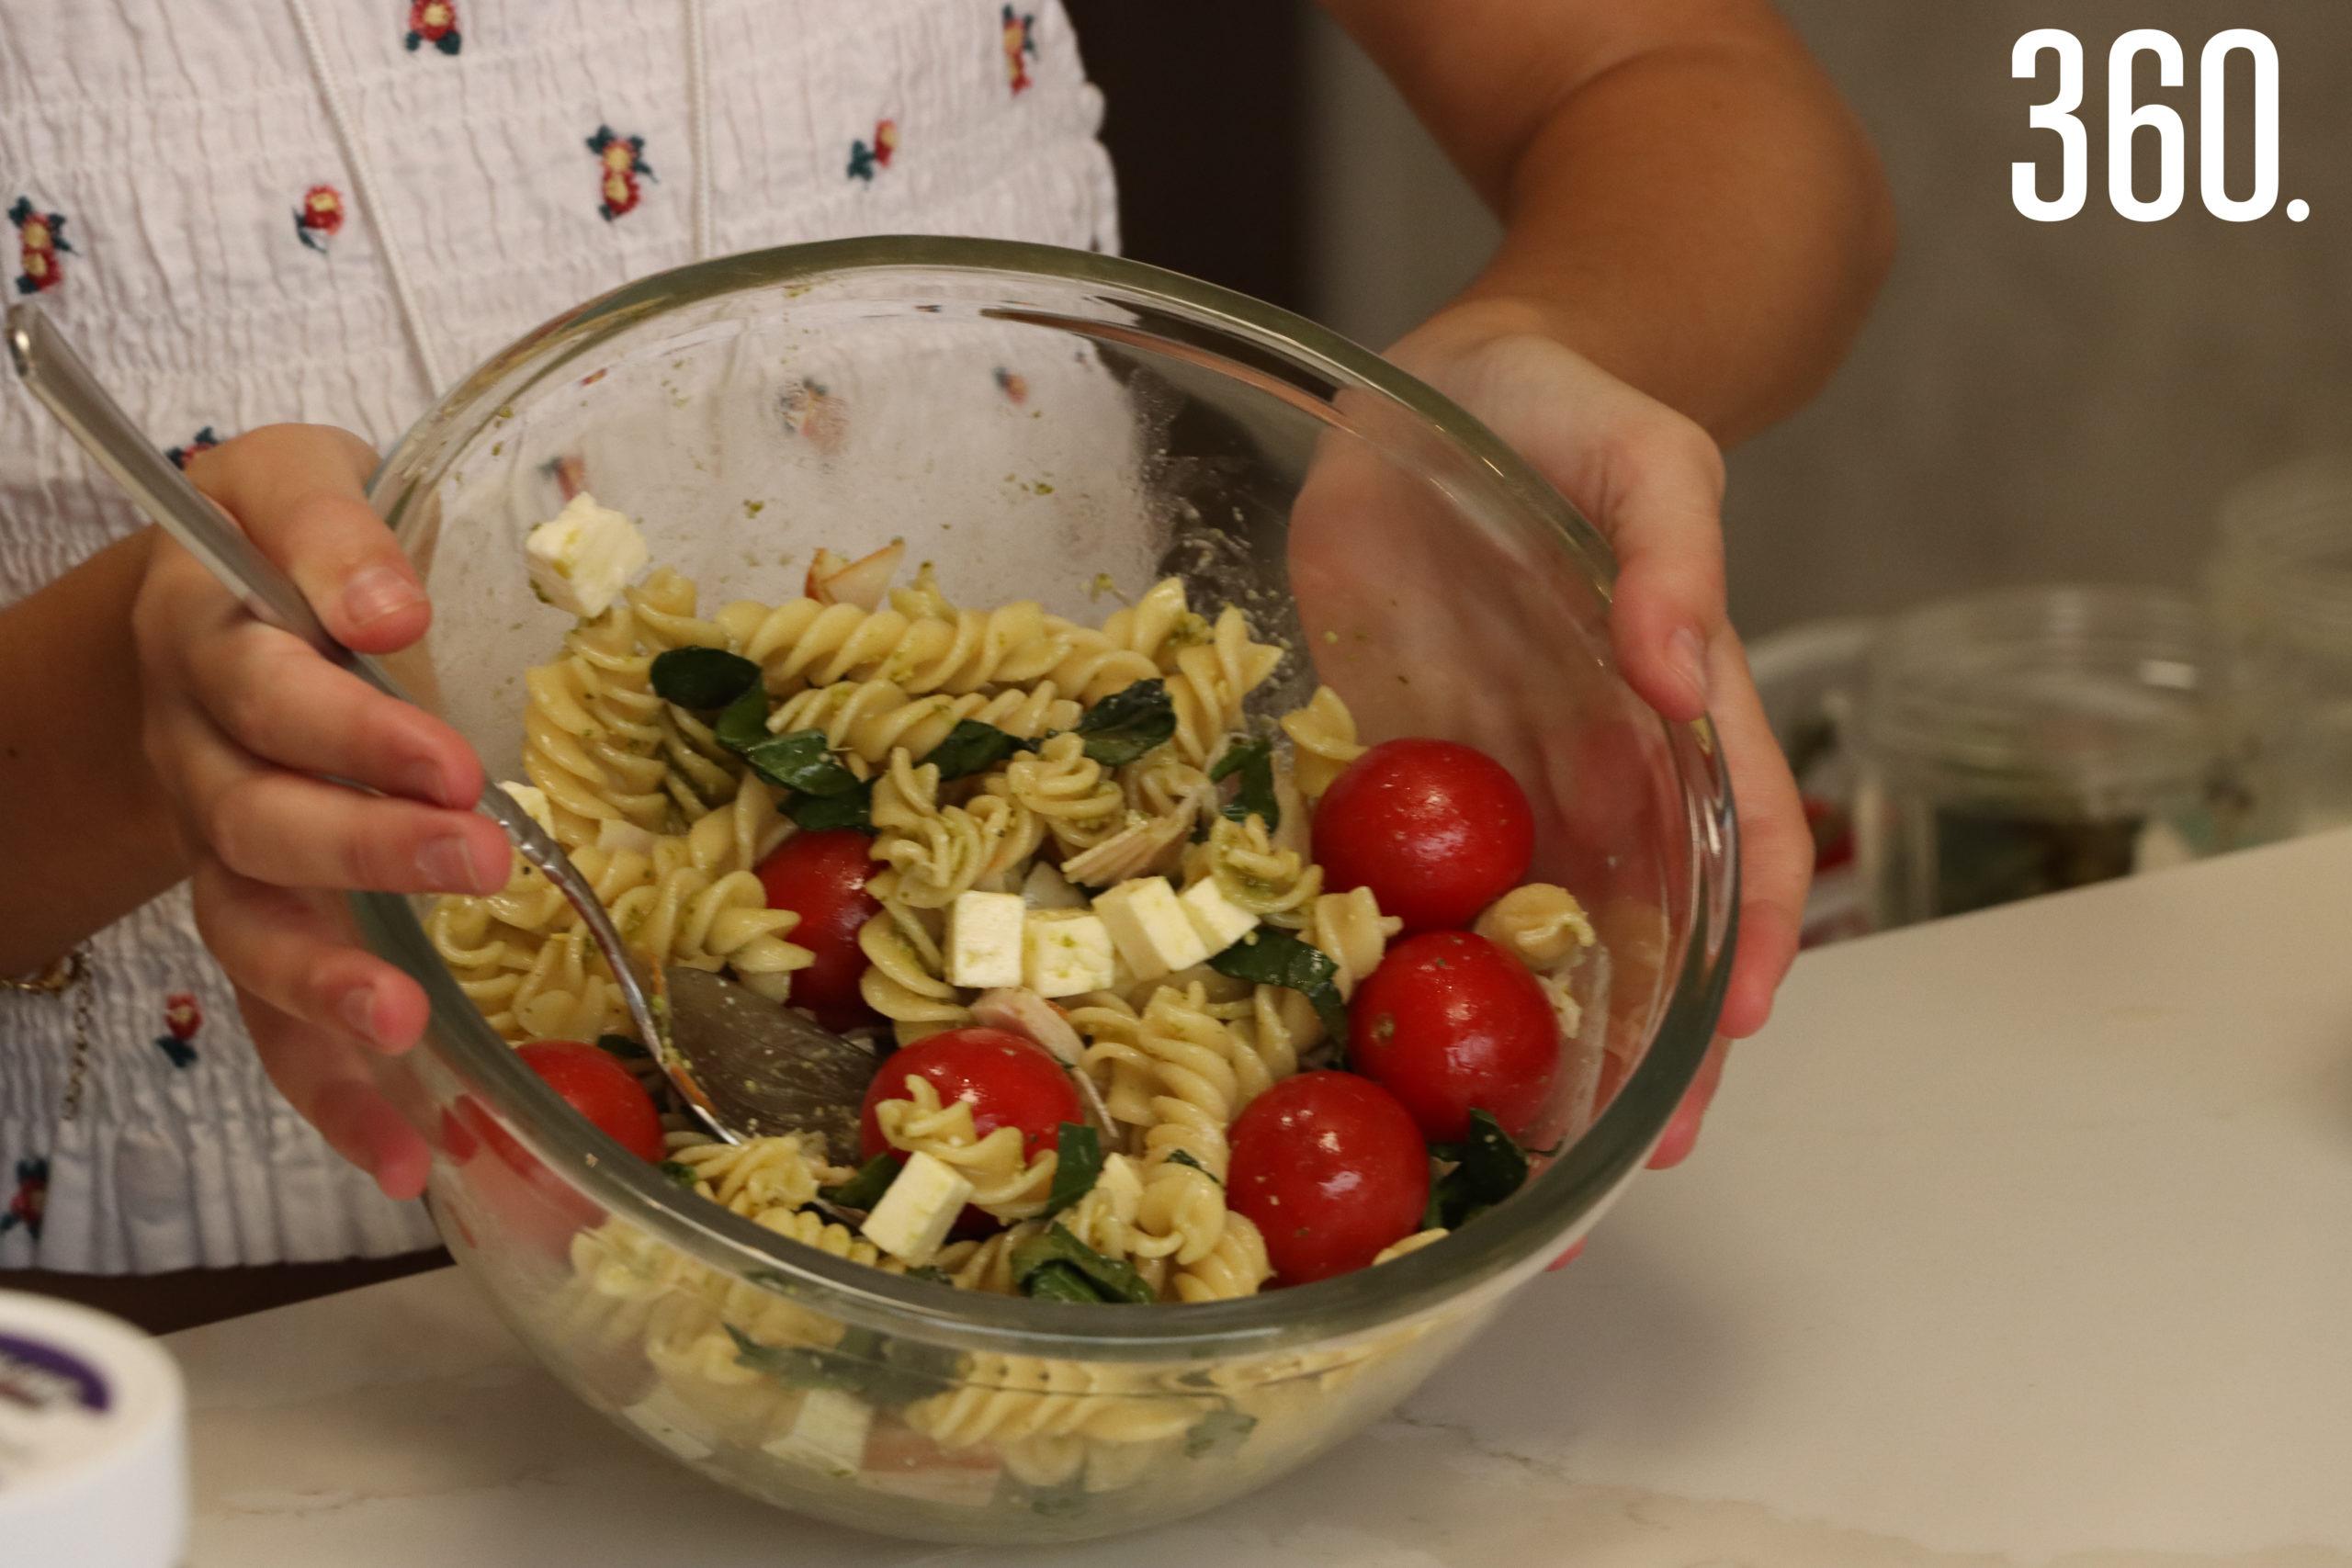 Pesto con jamón de pavo, queso panela, espinacas y tomate cherry.